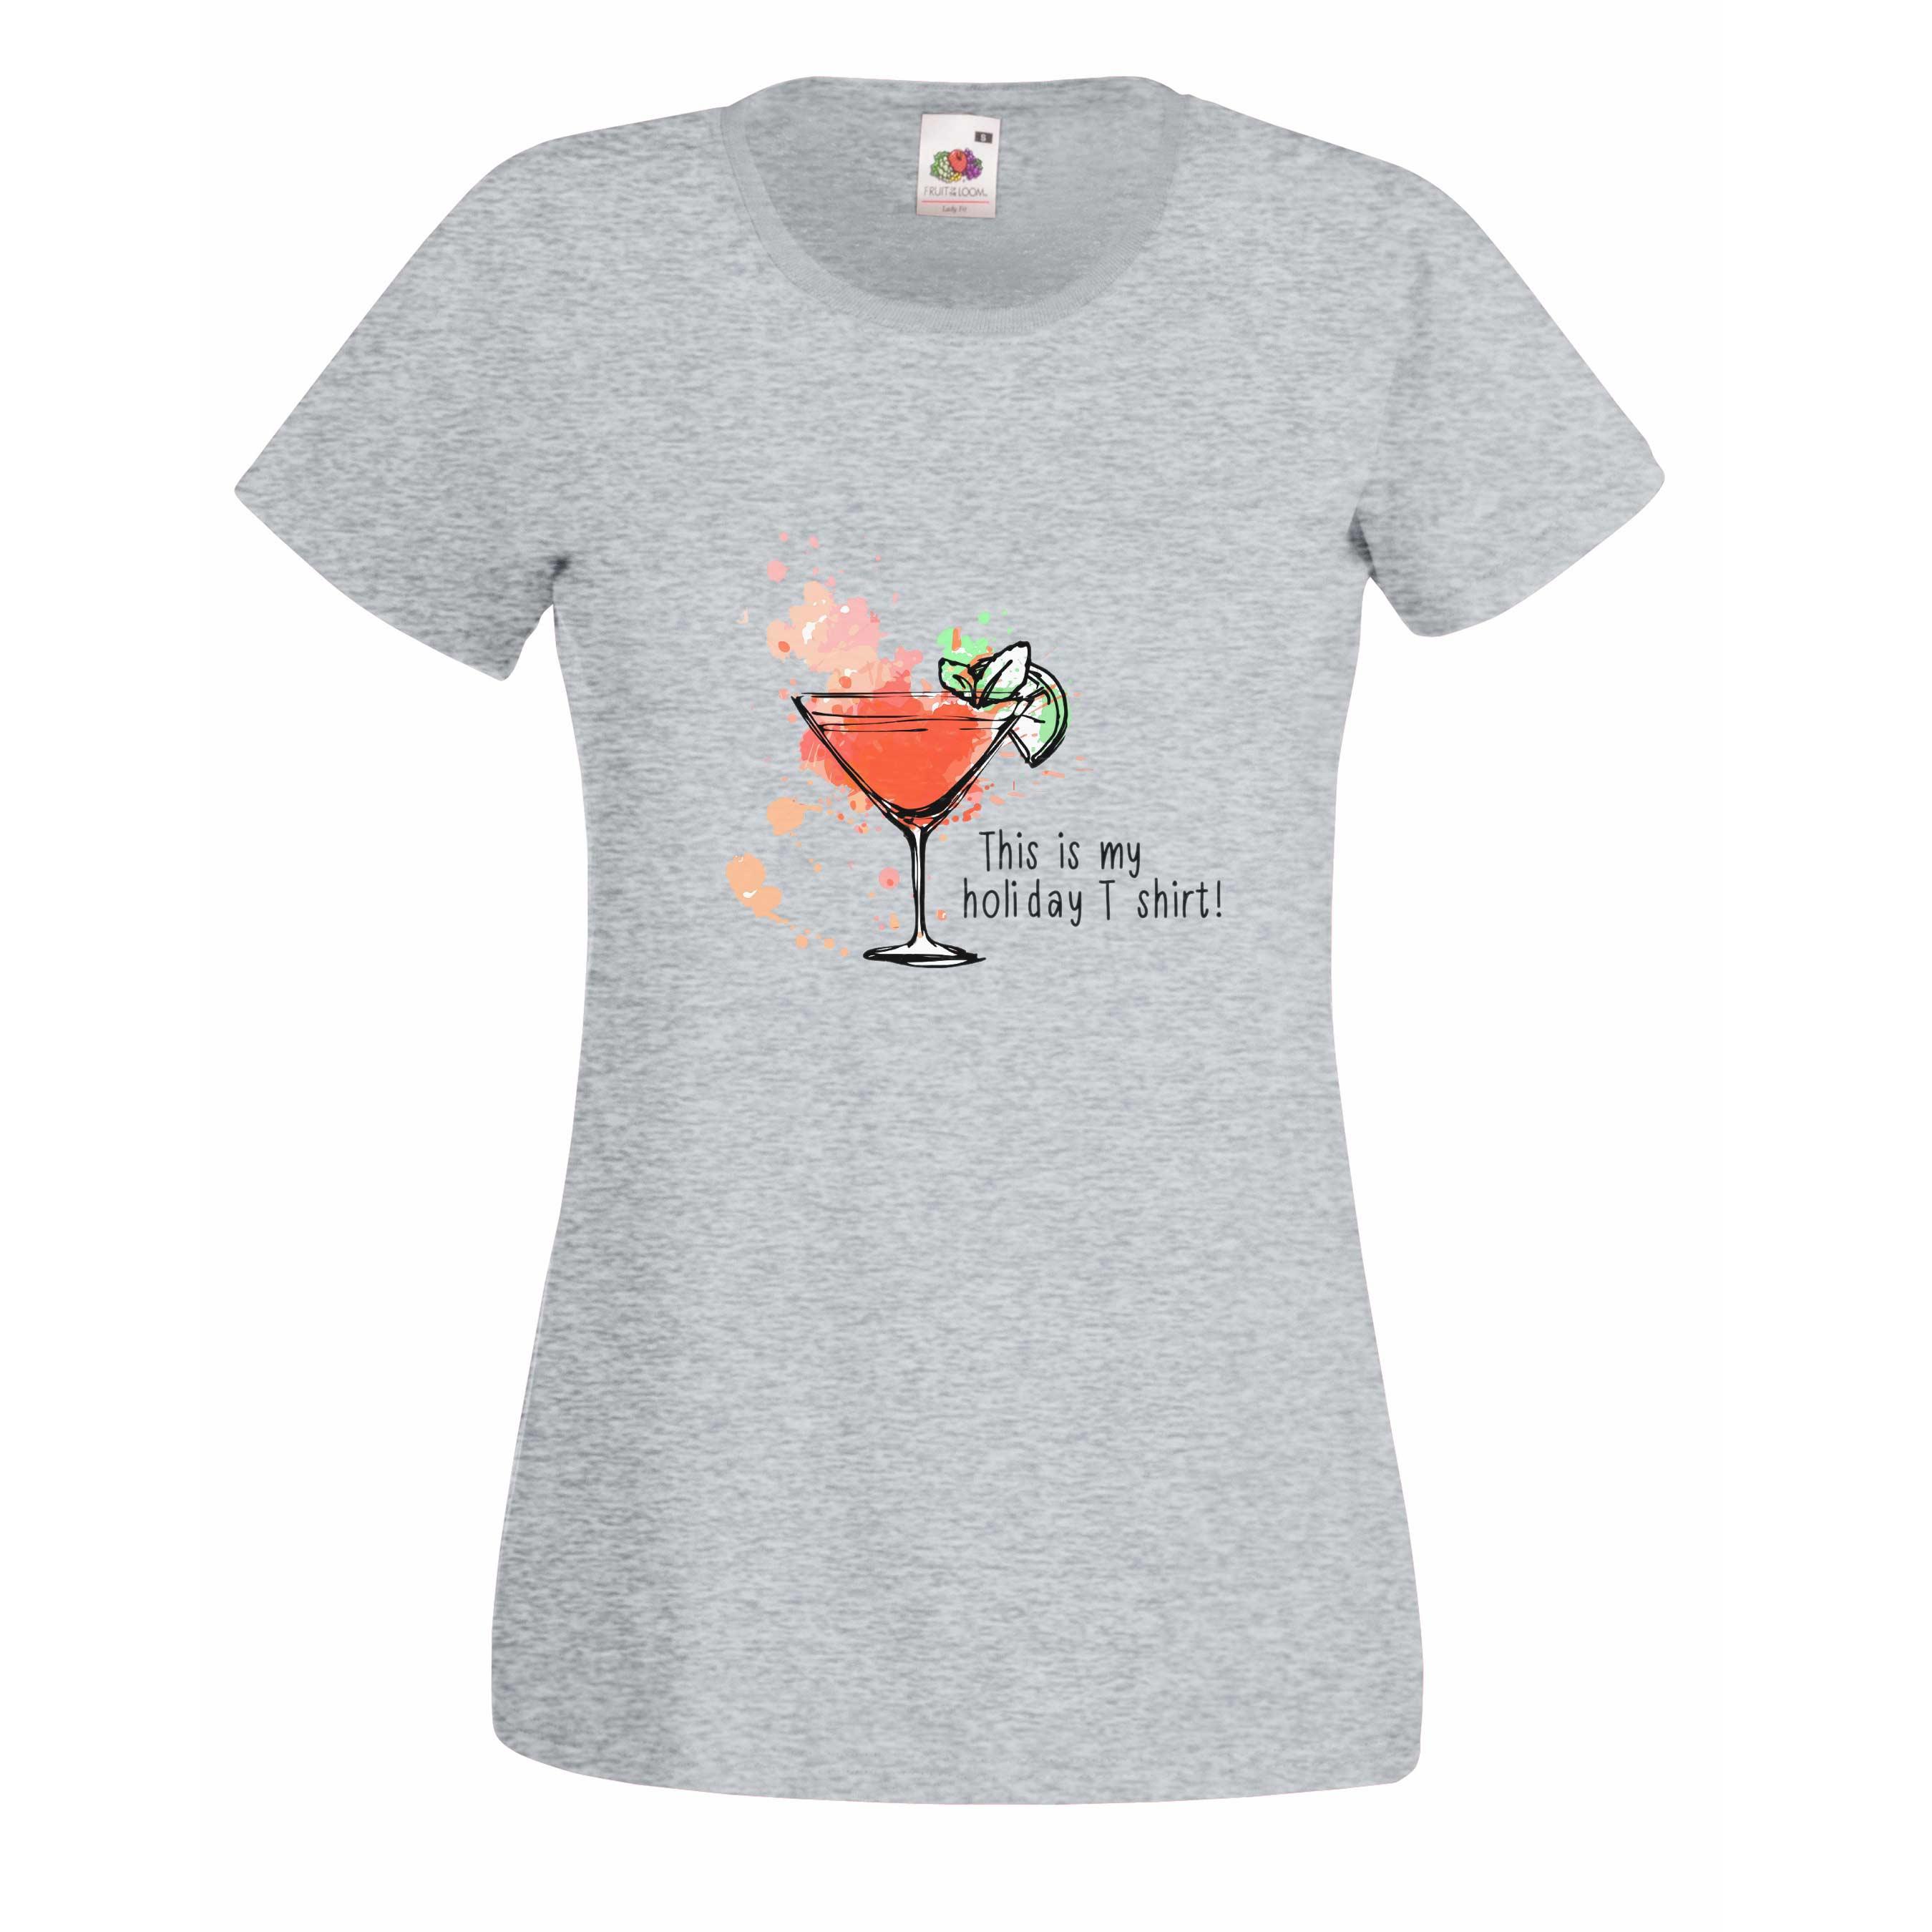 Holiday T-Shirt design for t-shirt, hoodie & sweatshirt